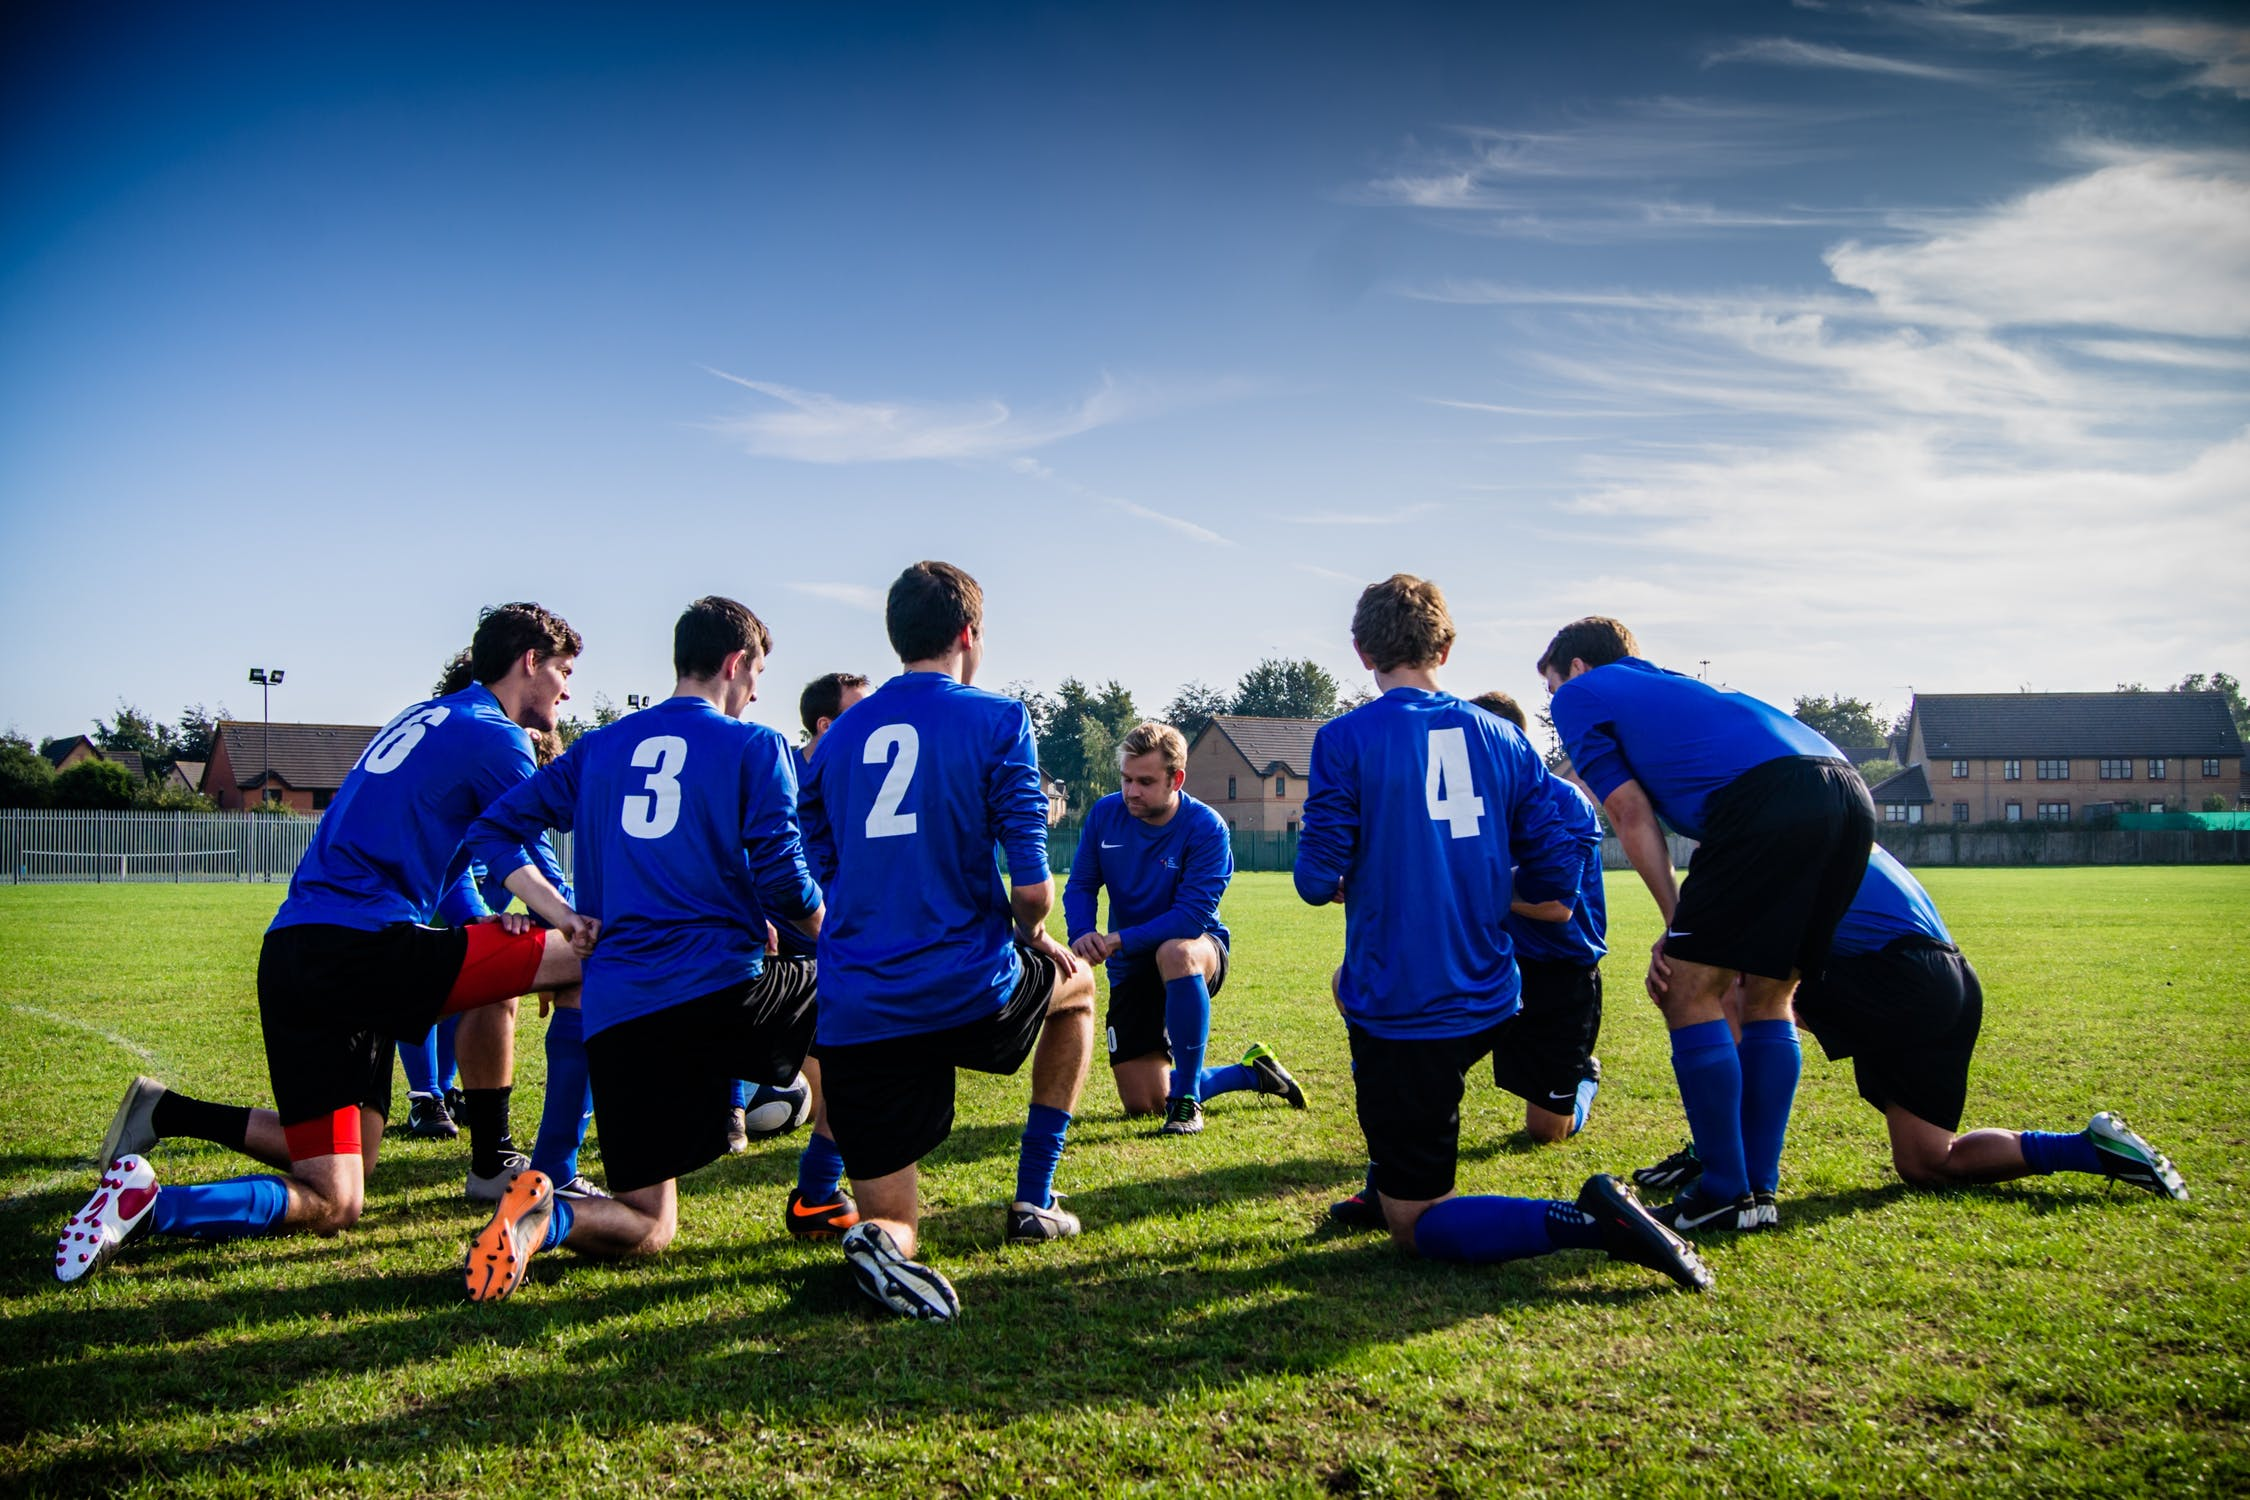 Soccer Sixes - Football Leagues